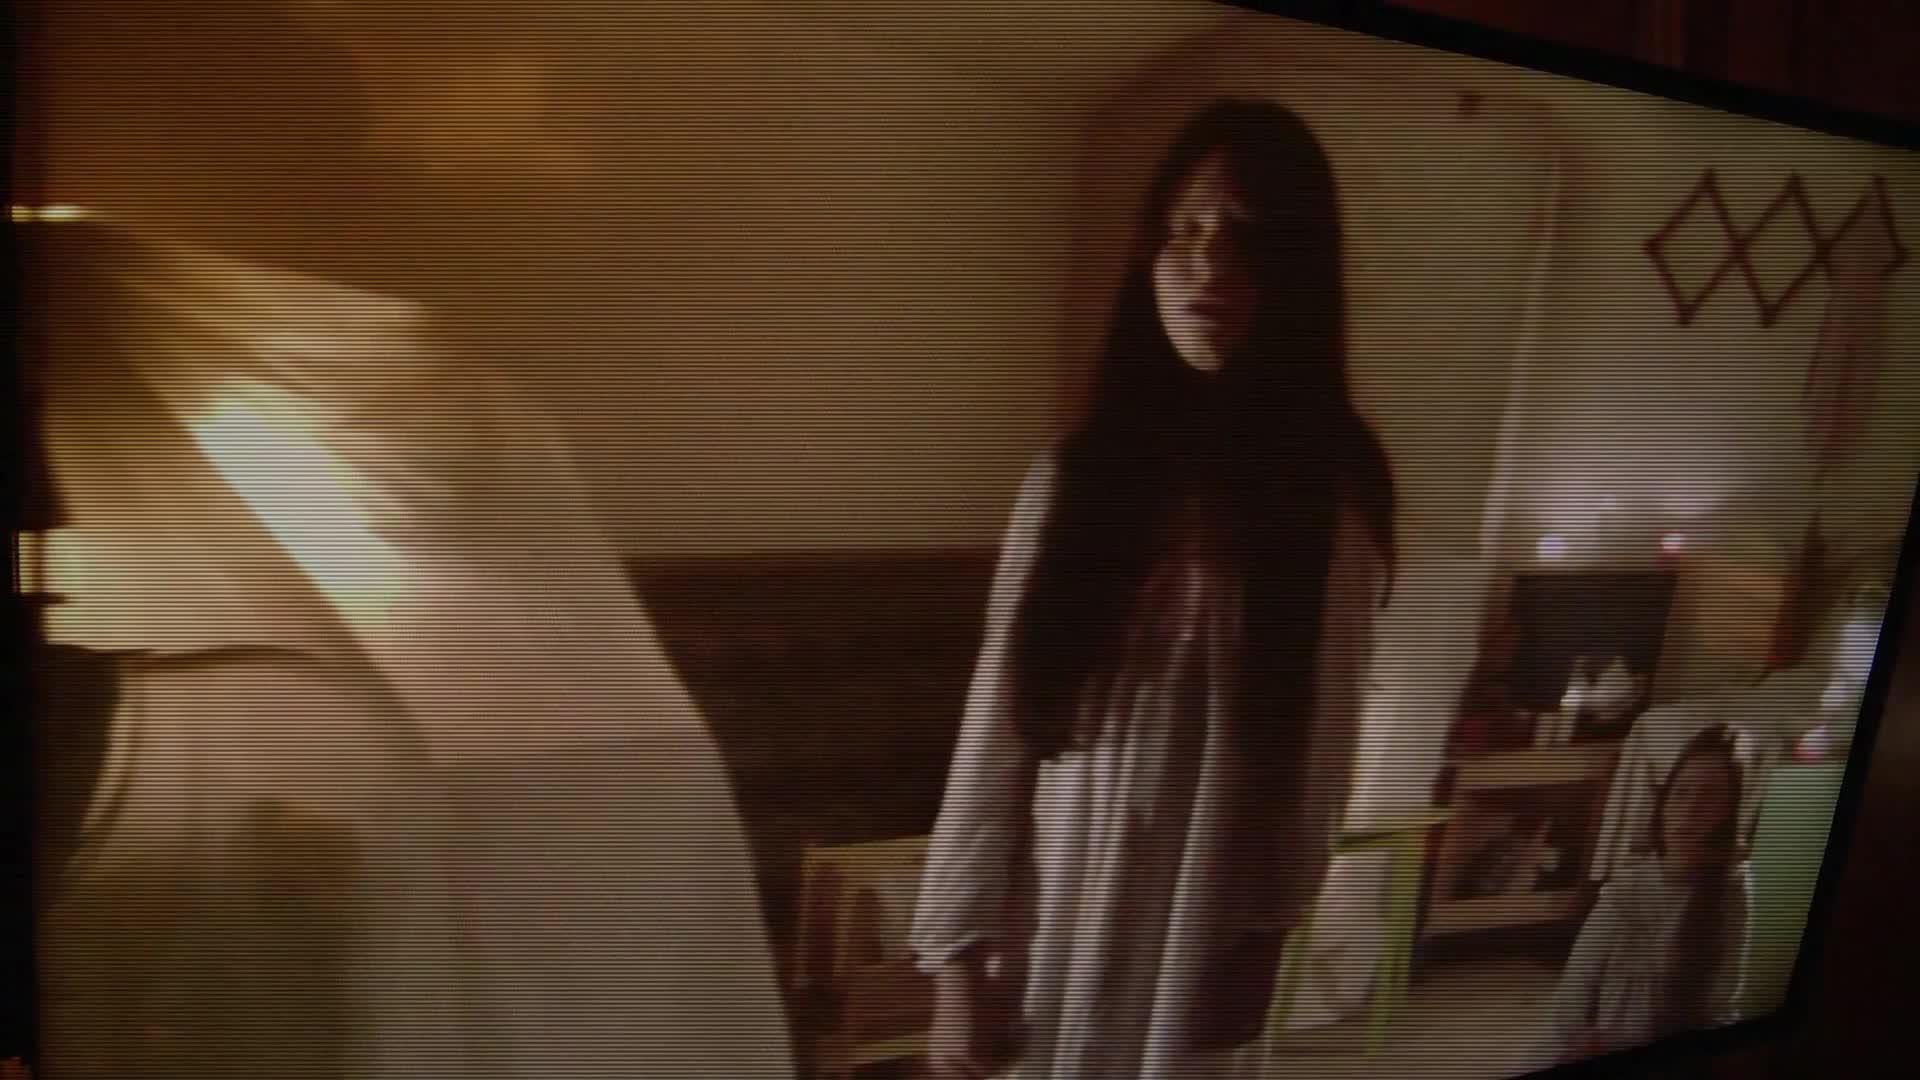 Reismann Lüdinghausen trailer 1 from paranormal activity the ghost dimension 2015